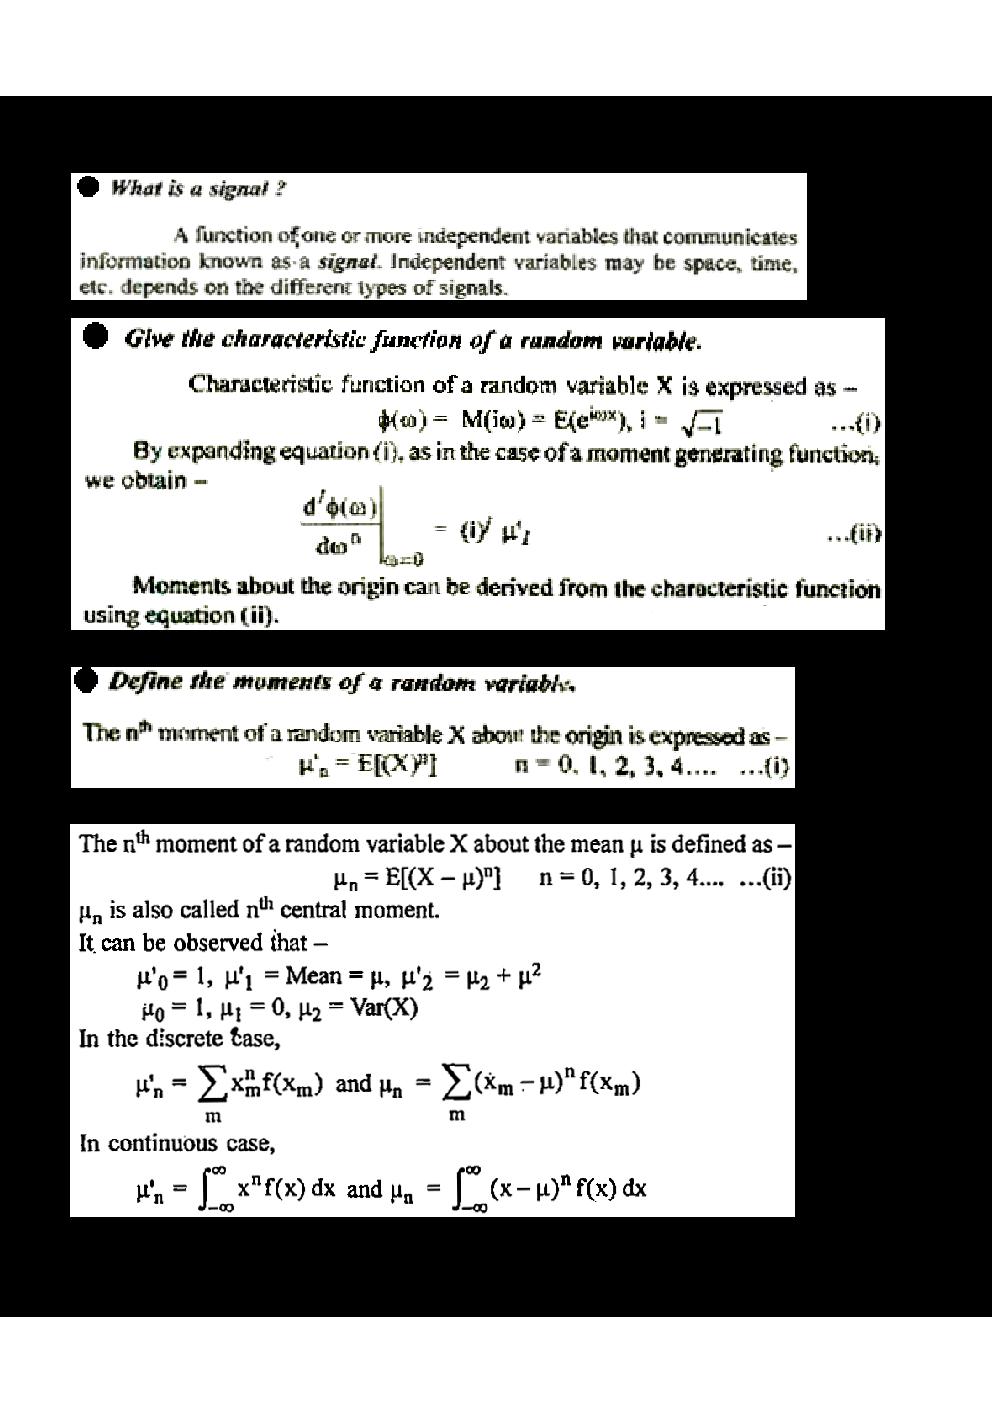 Digital Communication For RGPV B.E. 5th Sem Electronics & Communication Engineering - Page 4